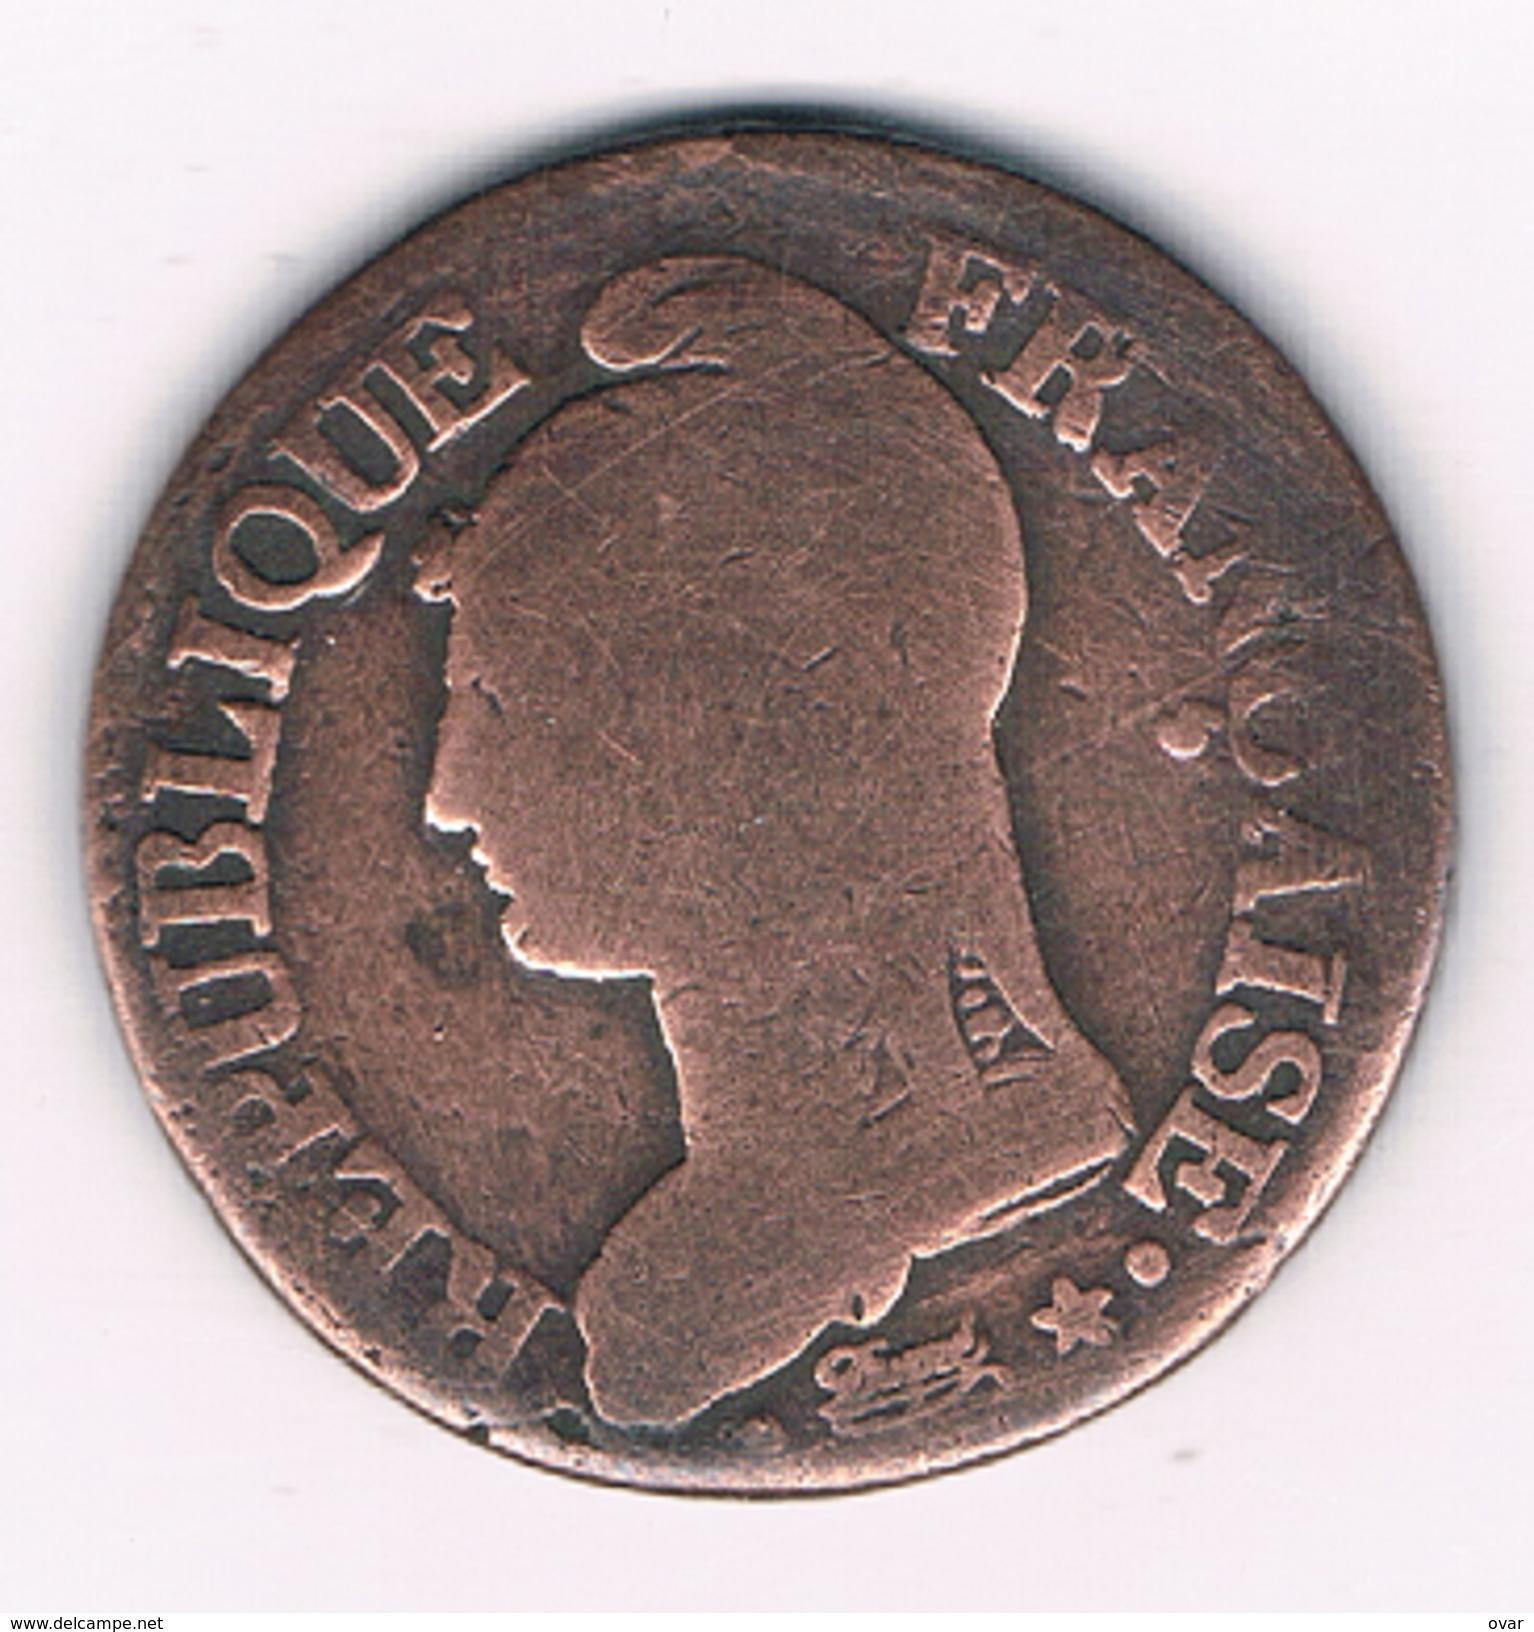 5 CENTIMES L'AN7 (1798) W LILLE  FRANKRIJK /1467C/ - France